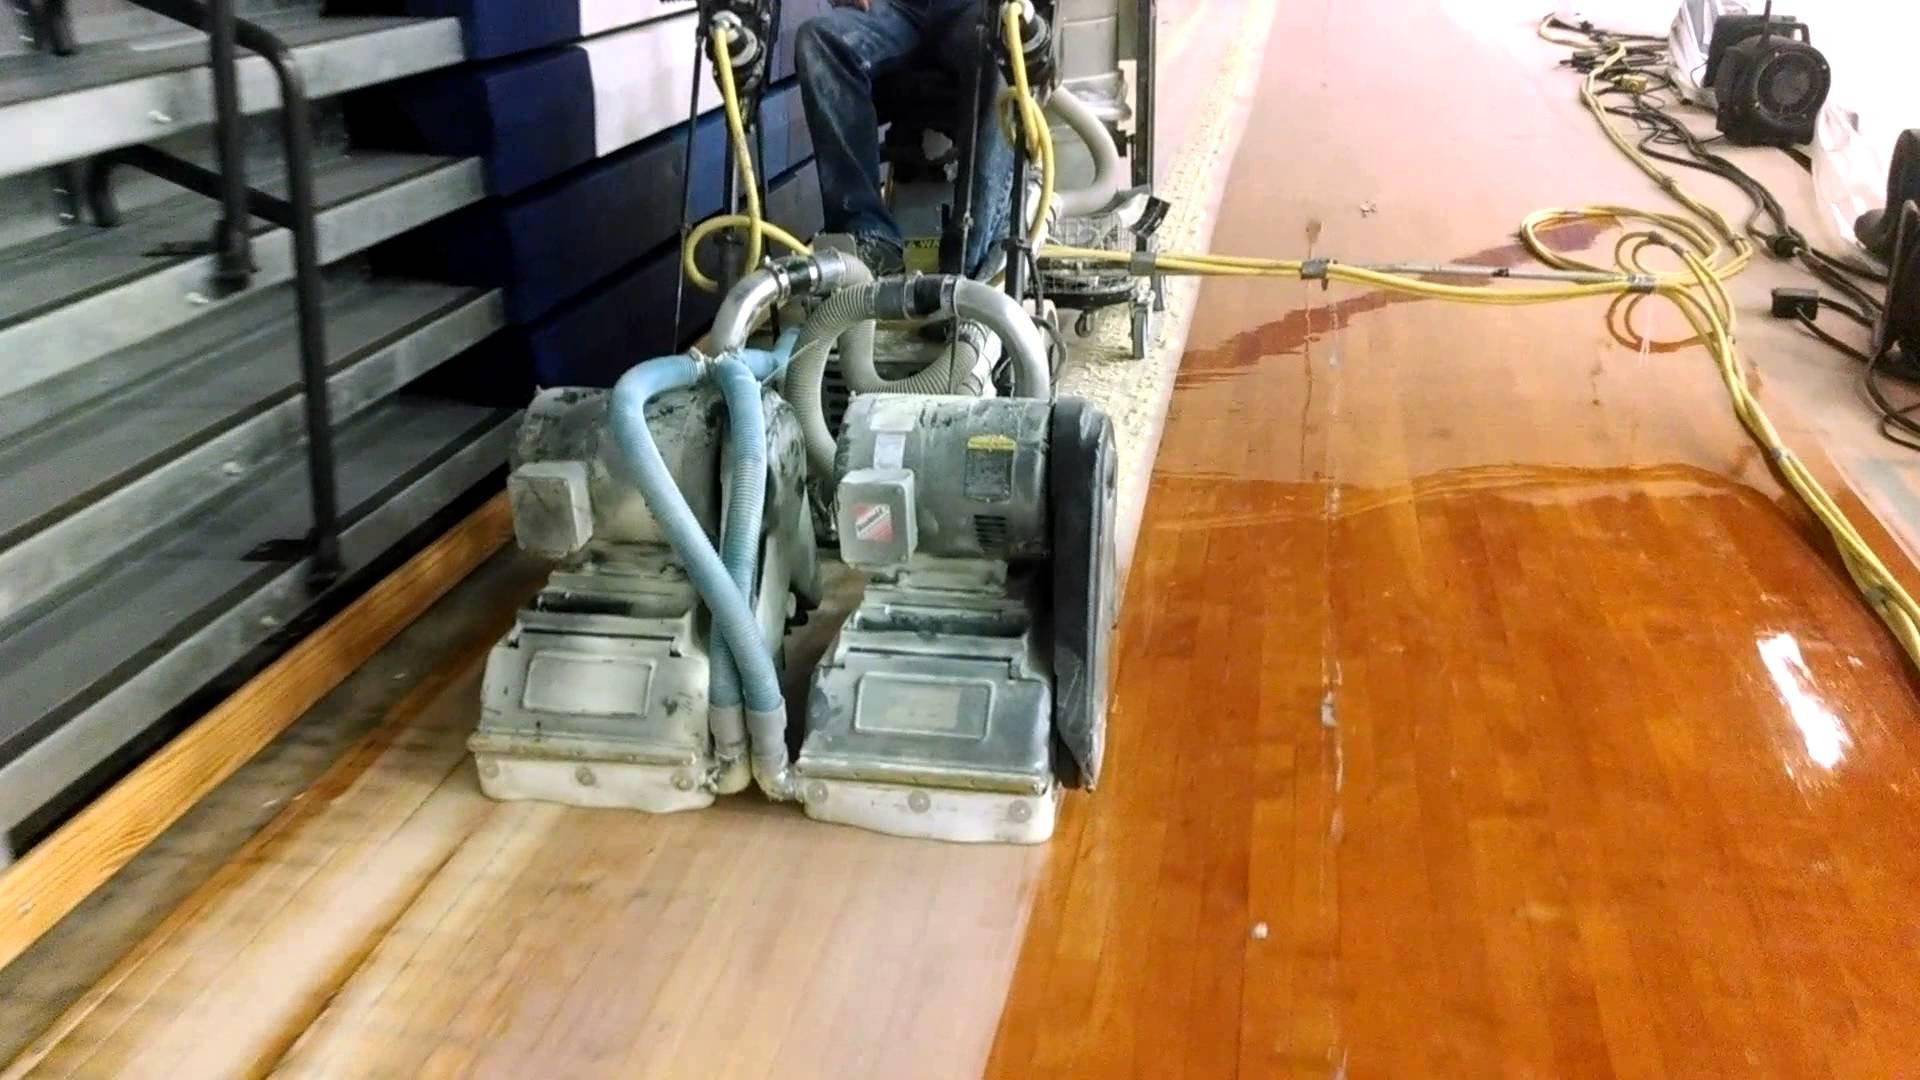 refinishing hardwood floors drum sander of floor refinishing company hardwood floors service by cris floor for floor refinishing company gym floor sanding and refinishing